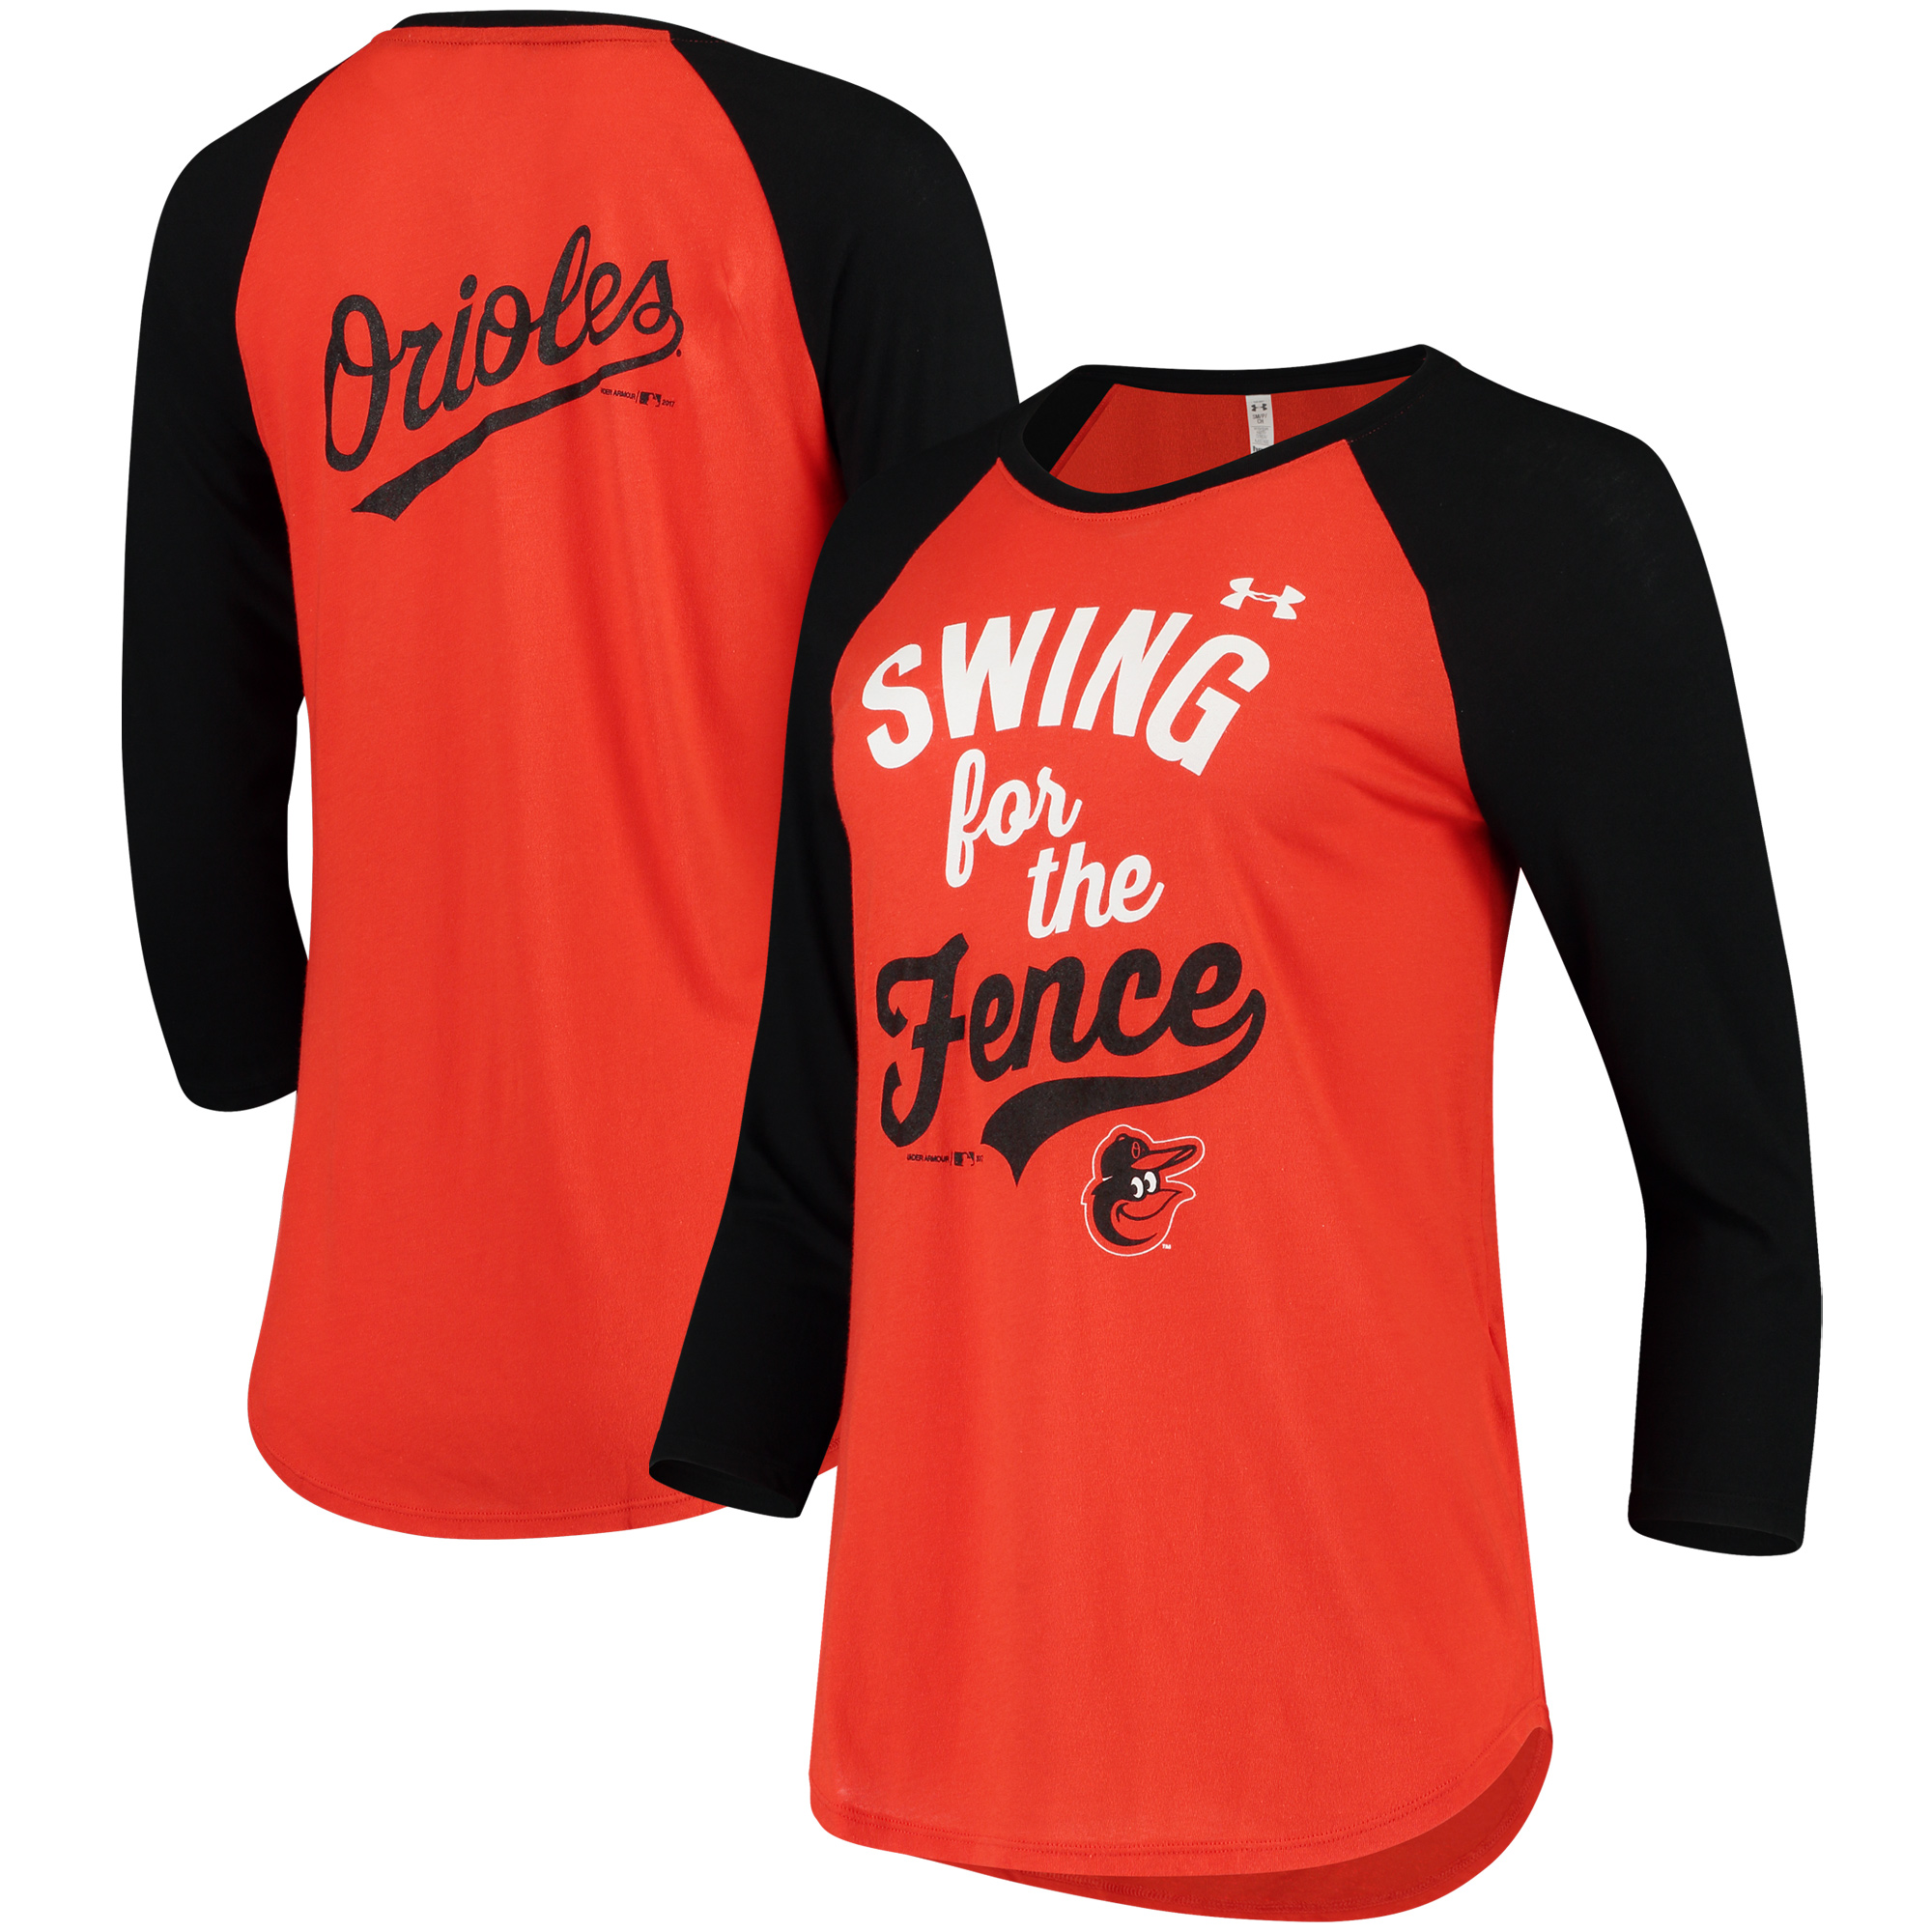 Baltimore Orioles Under Armour Women's Baseball 3/4-Sleeve Performance T-Shirt - Orange/Black